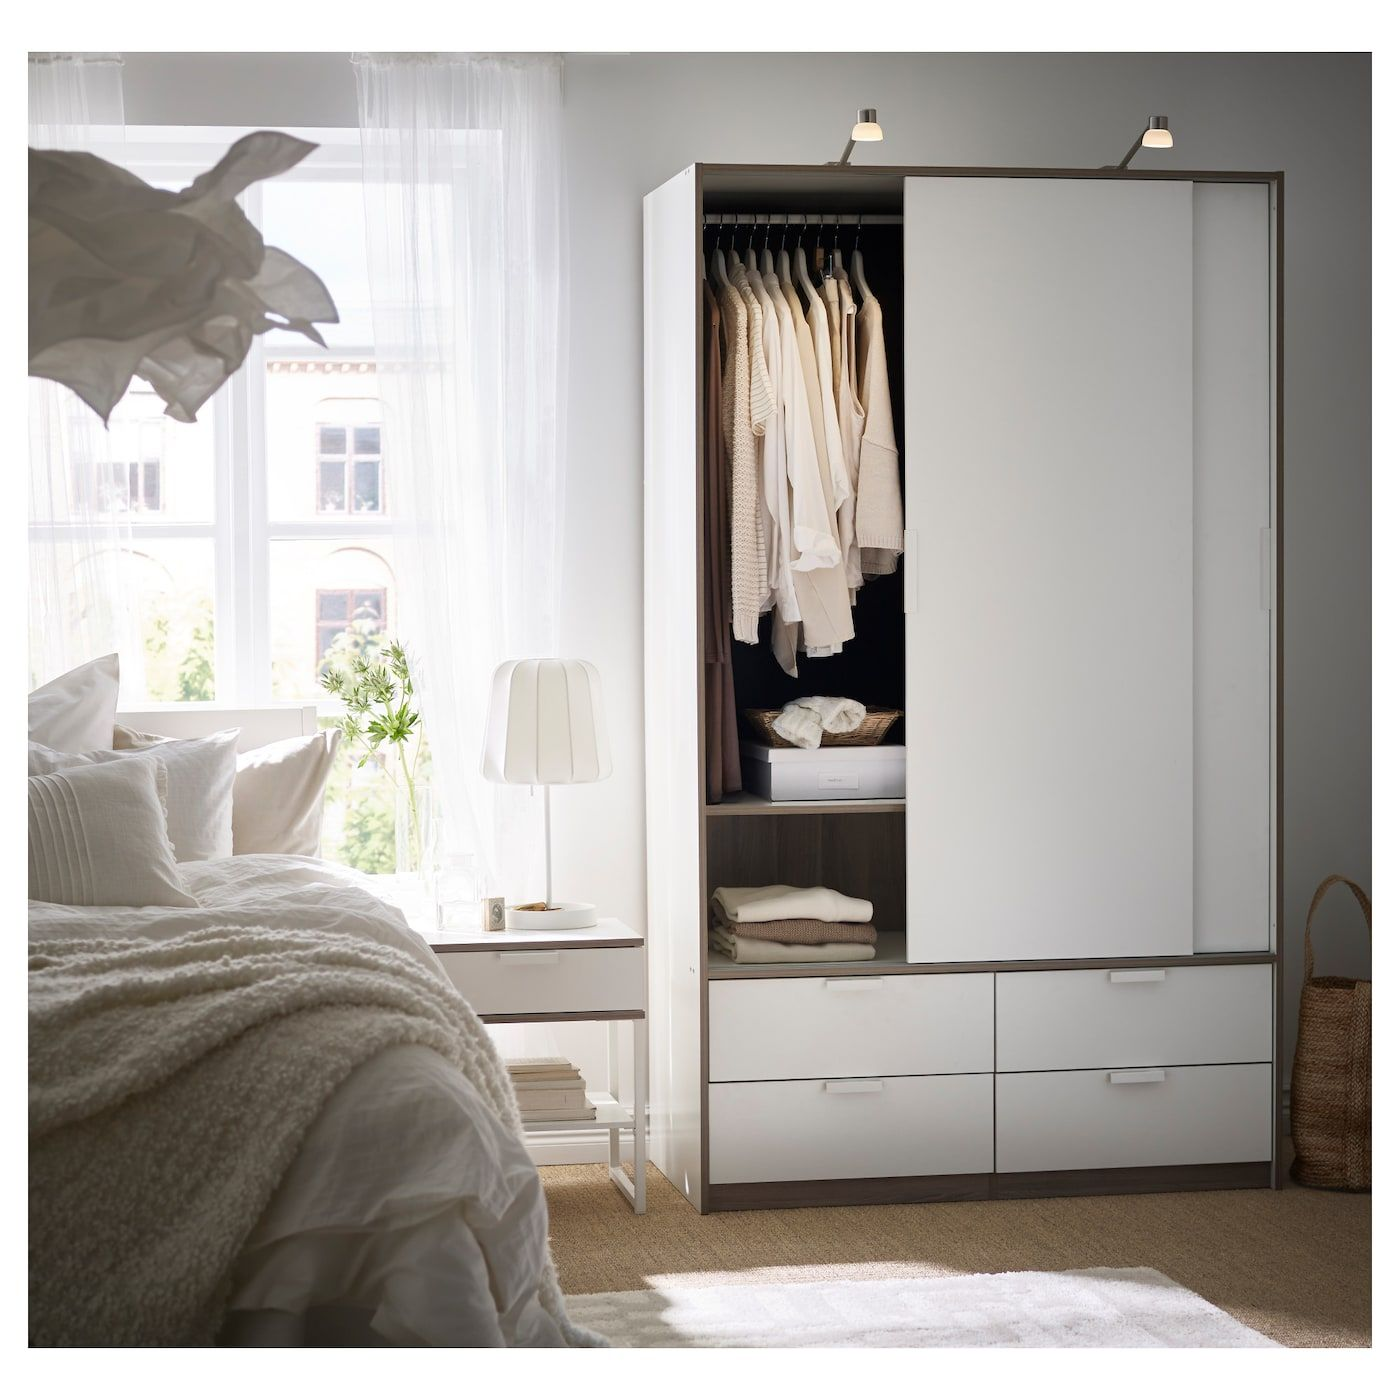 Trysil Armoire Portes Couliss 4tiroirs Blanc Ikea Ikea Armoire Ikea Mobilier De Salon